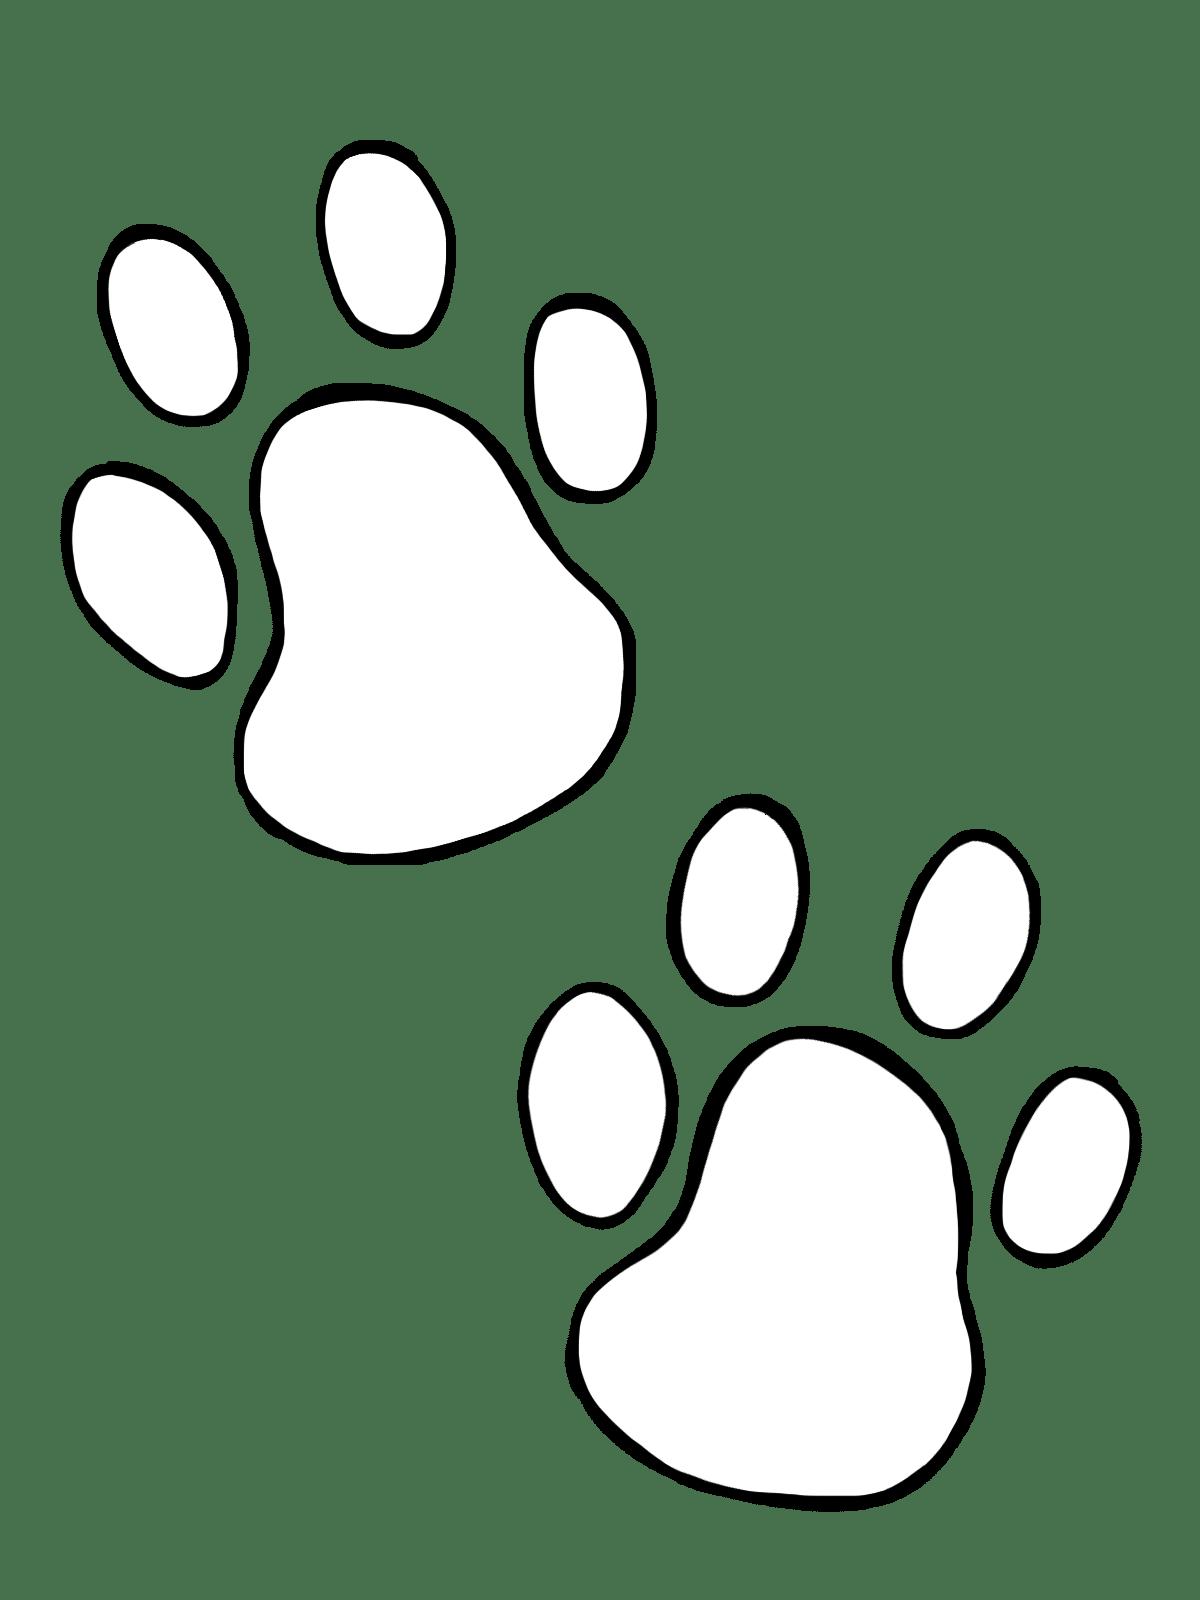 Dog Paws Clip Art